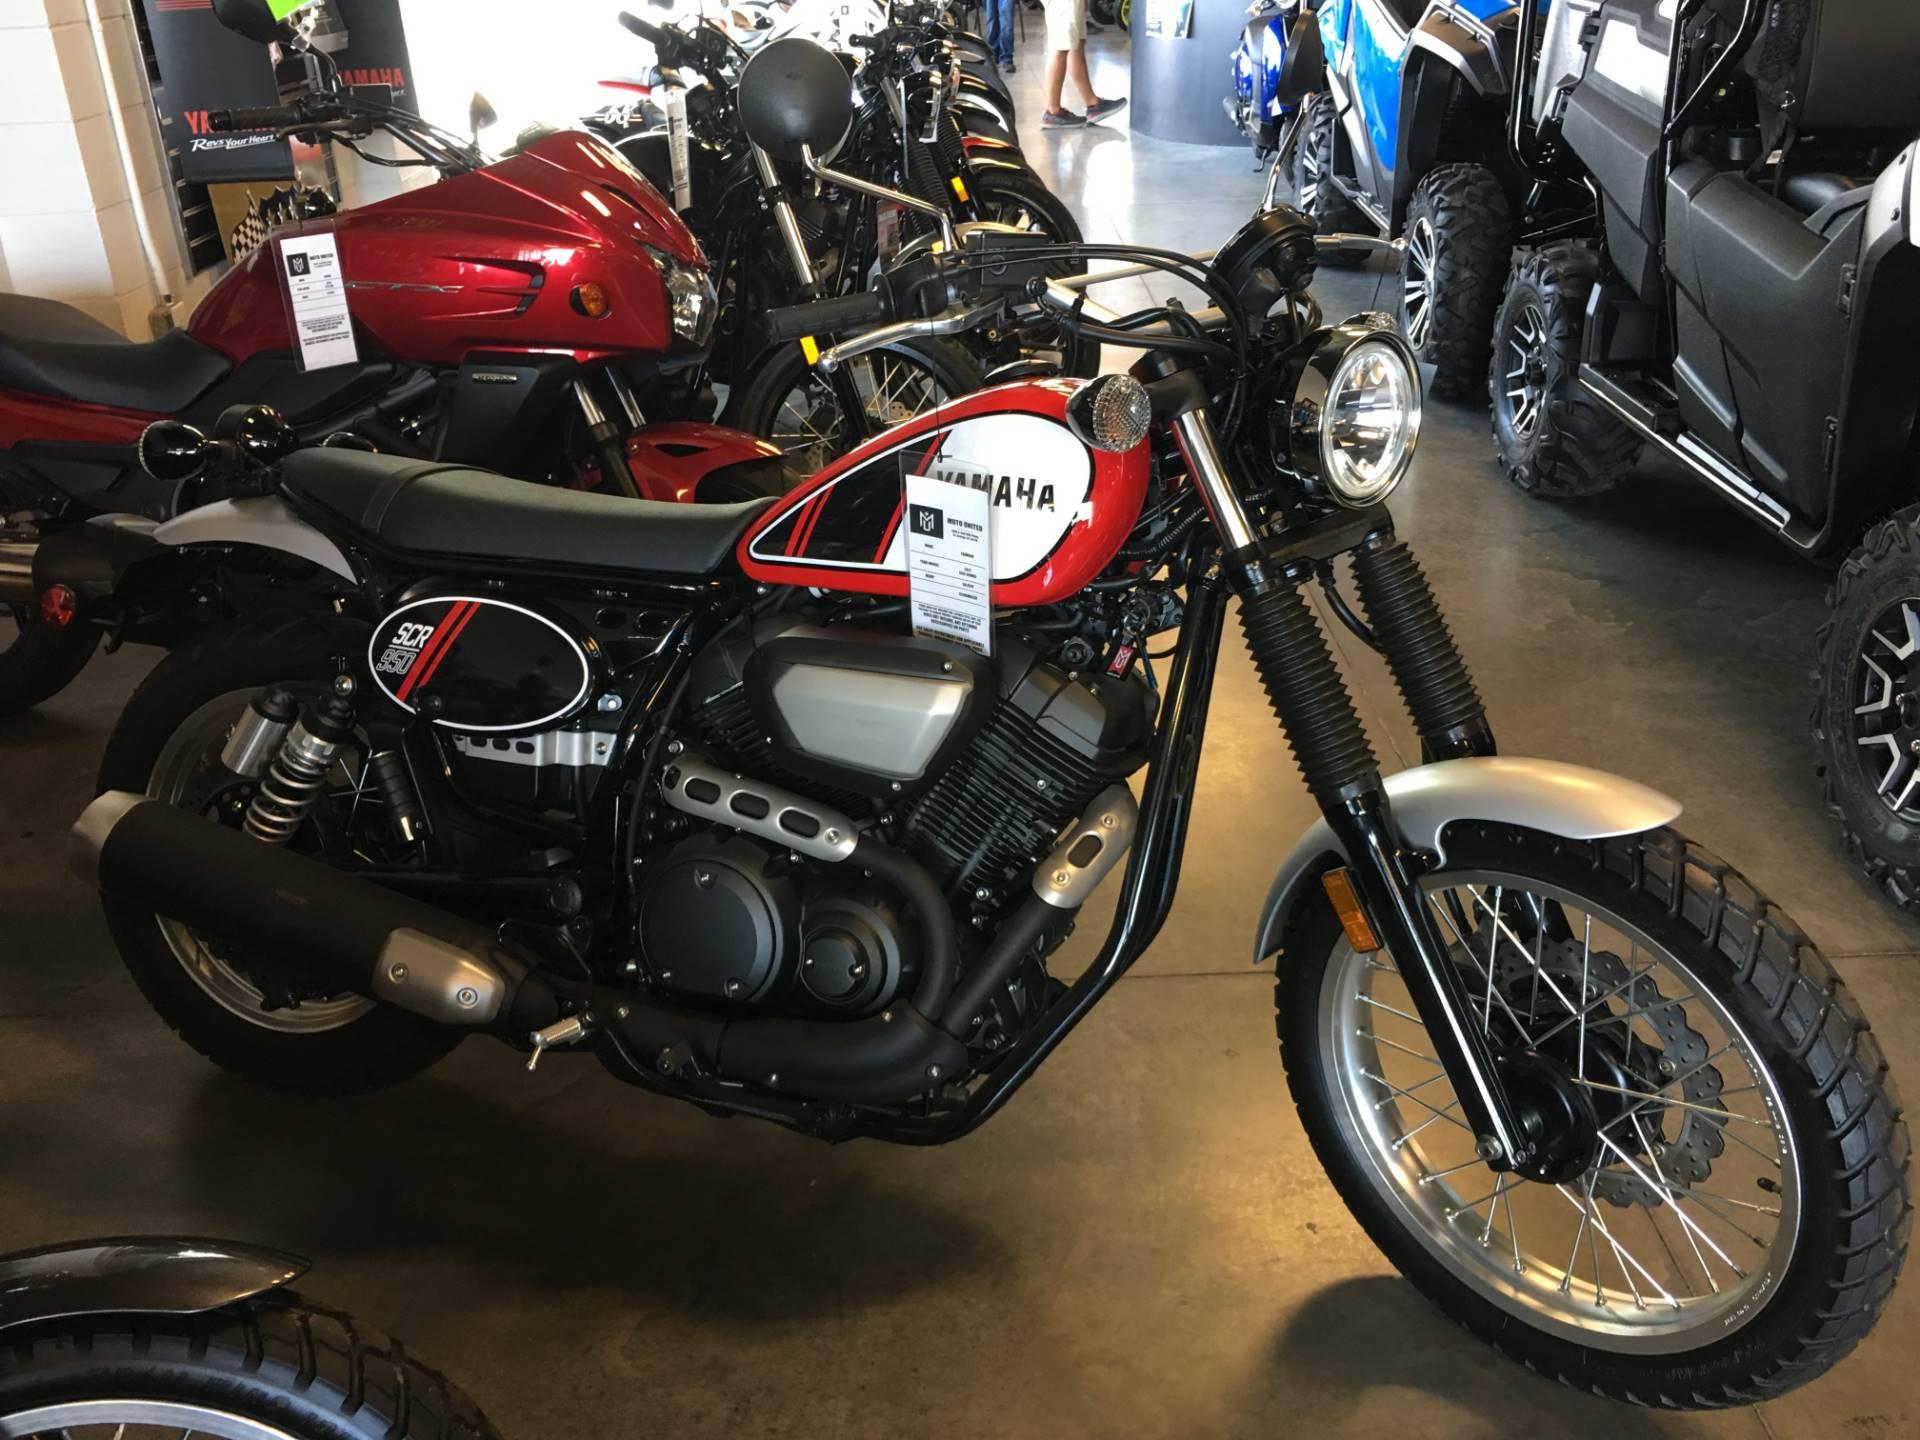 2017 Yamaha Scr950 In Saint George Utah